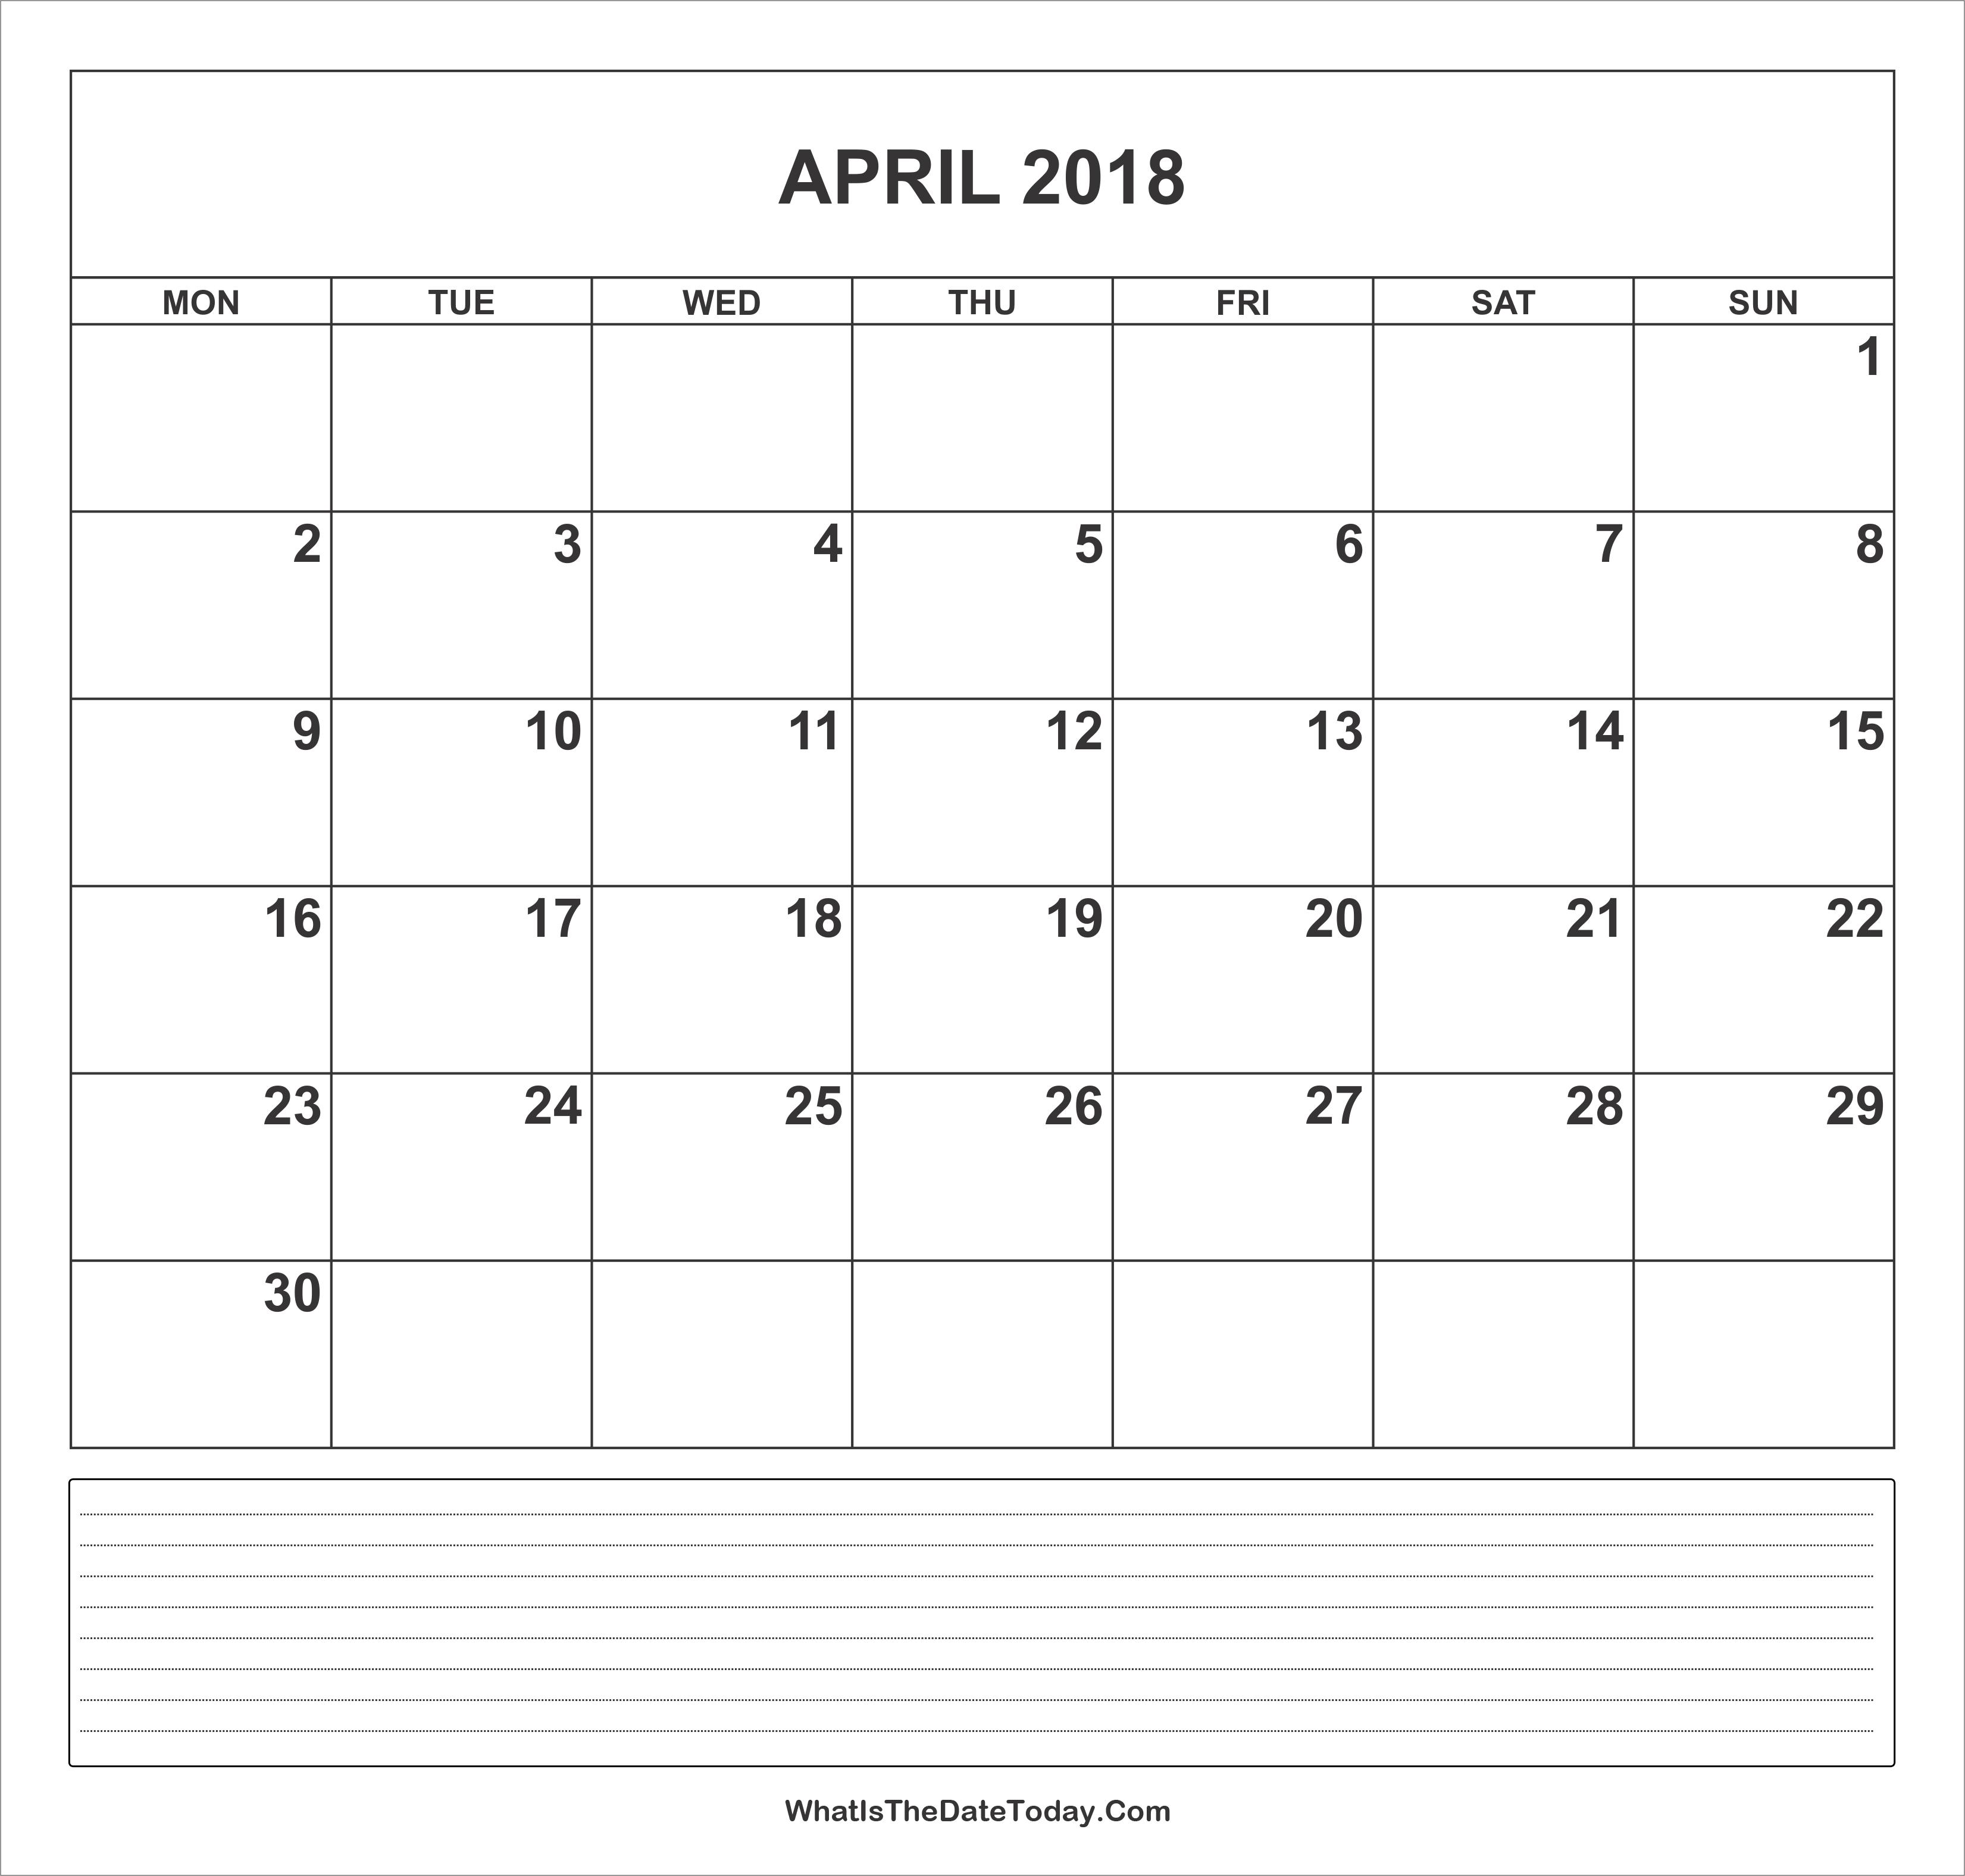 April Calendar Notes : Calendar april with notes whatisthedatetoday